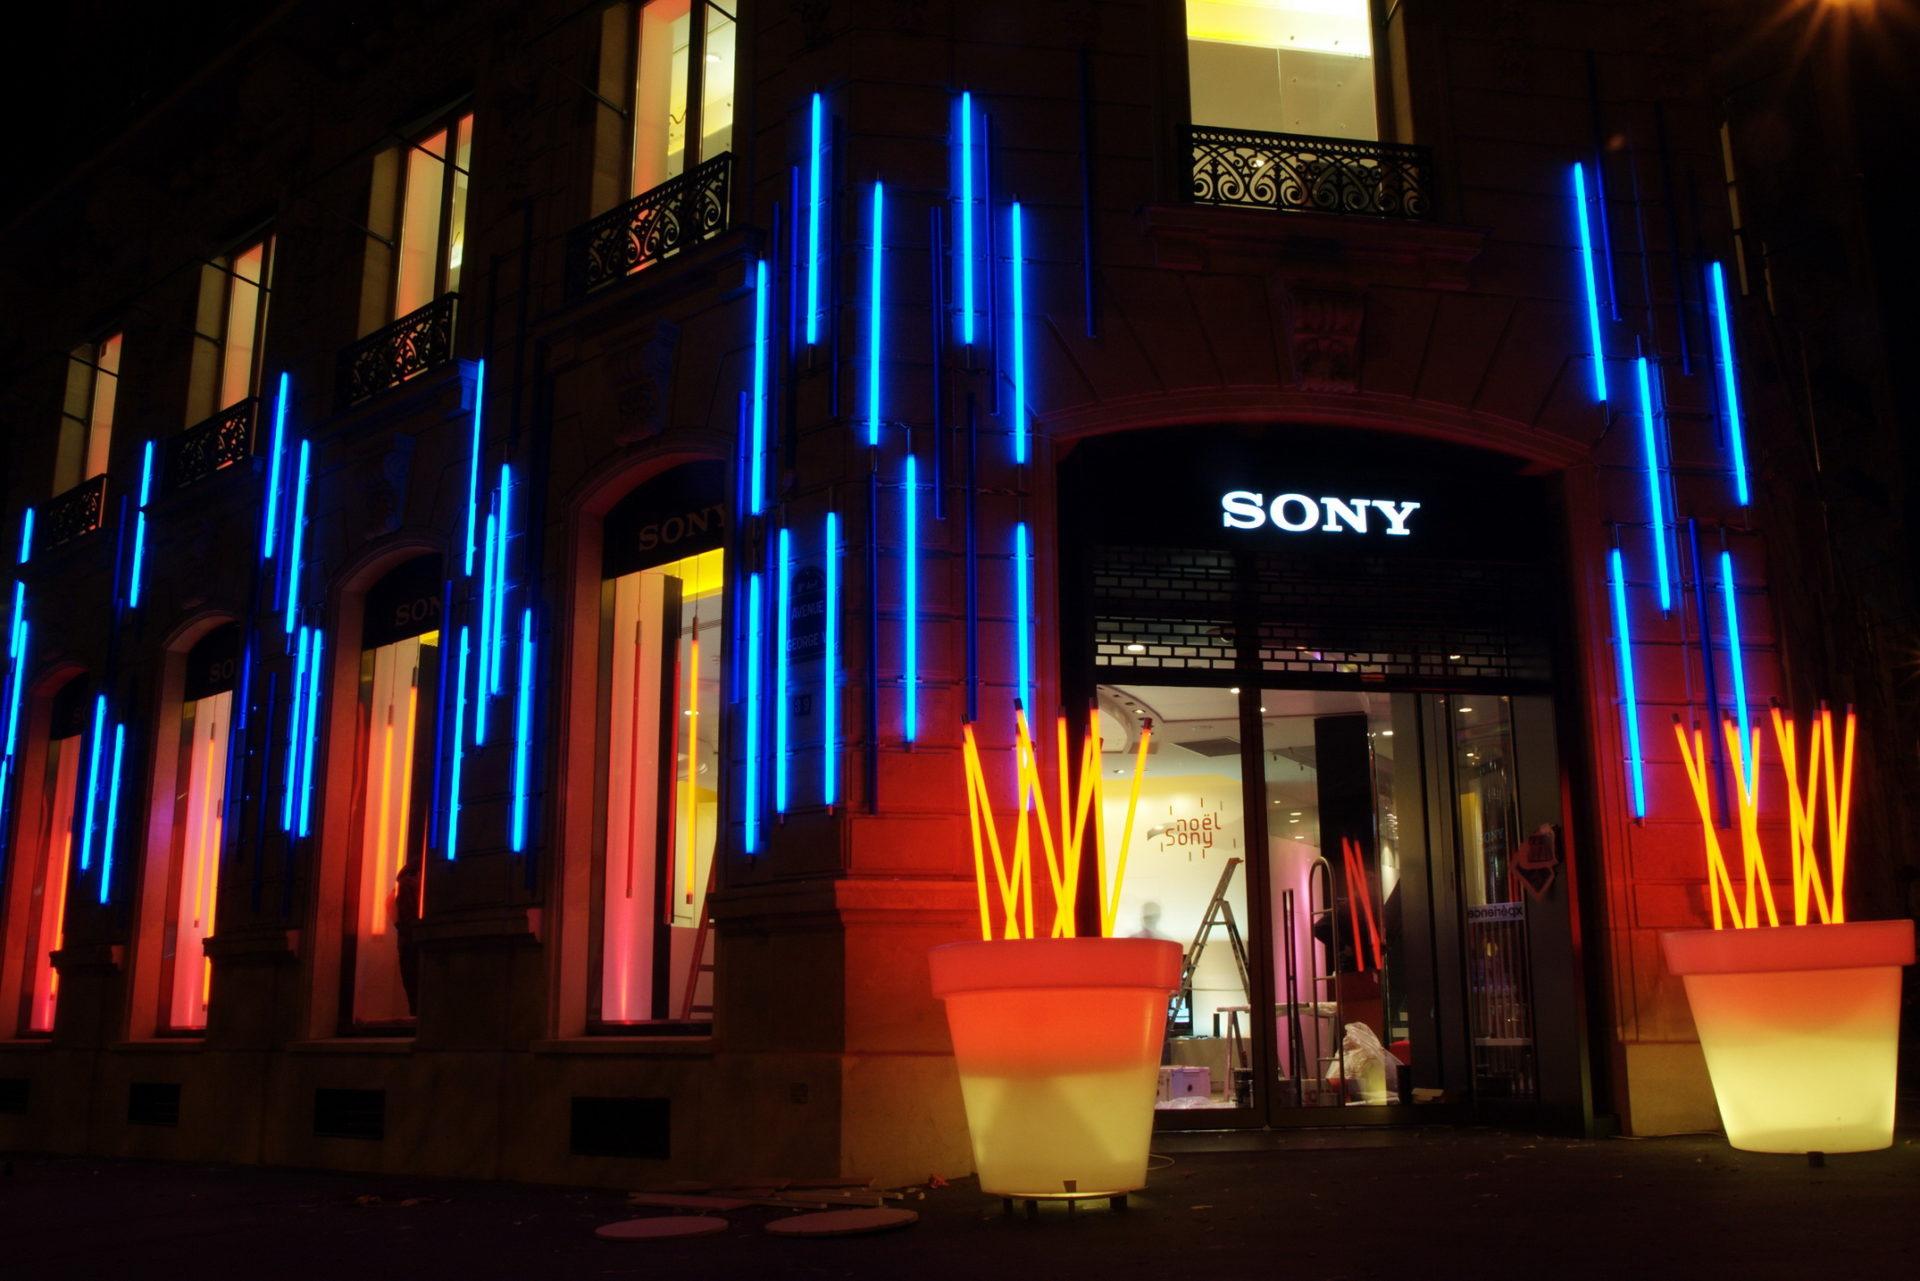 agencement, magasins, retail, concept store, habillage, vitrines, displays, corner, oépration commerciale, merchandising